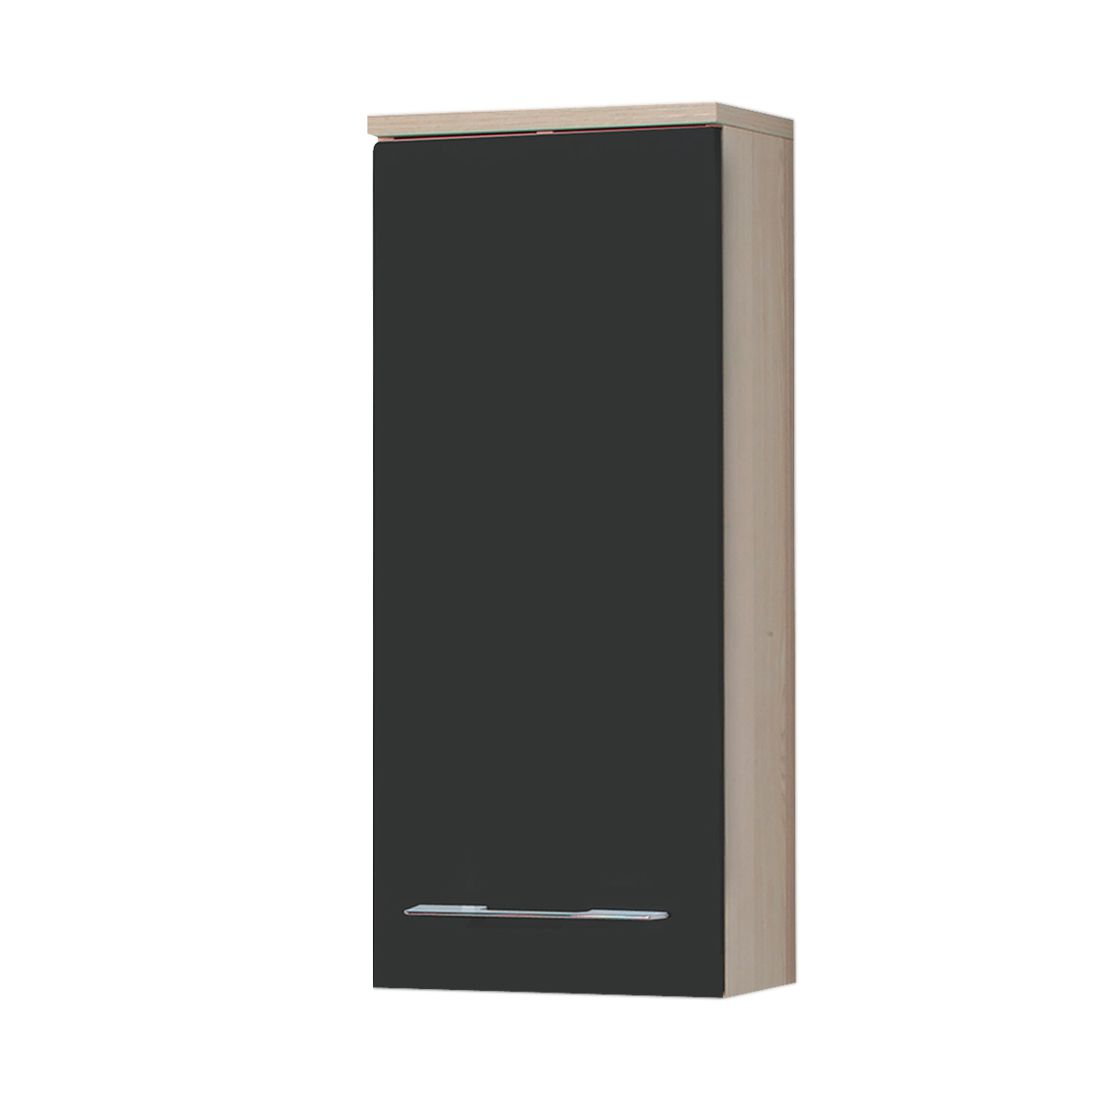 h ngeschrank alessandria anthrazit esche. Black Bedroom Furniture Sets. Home Design Ideas